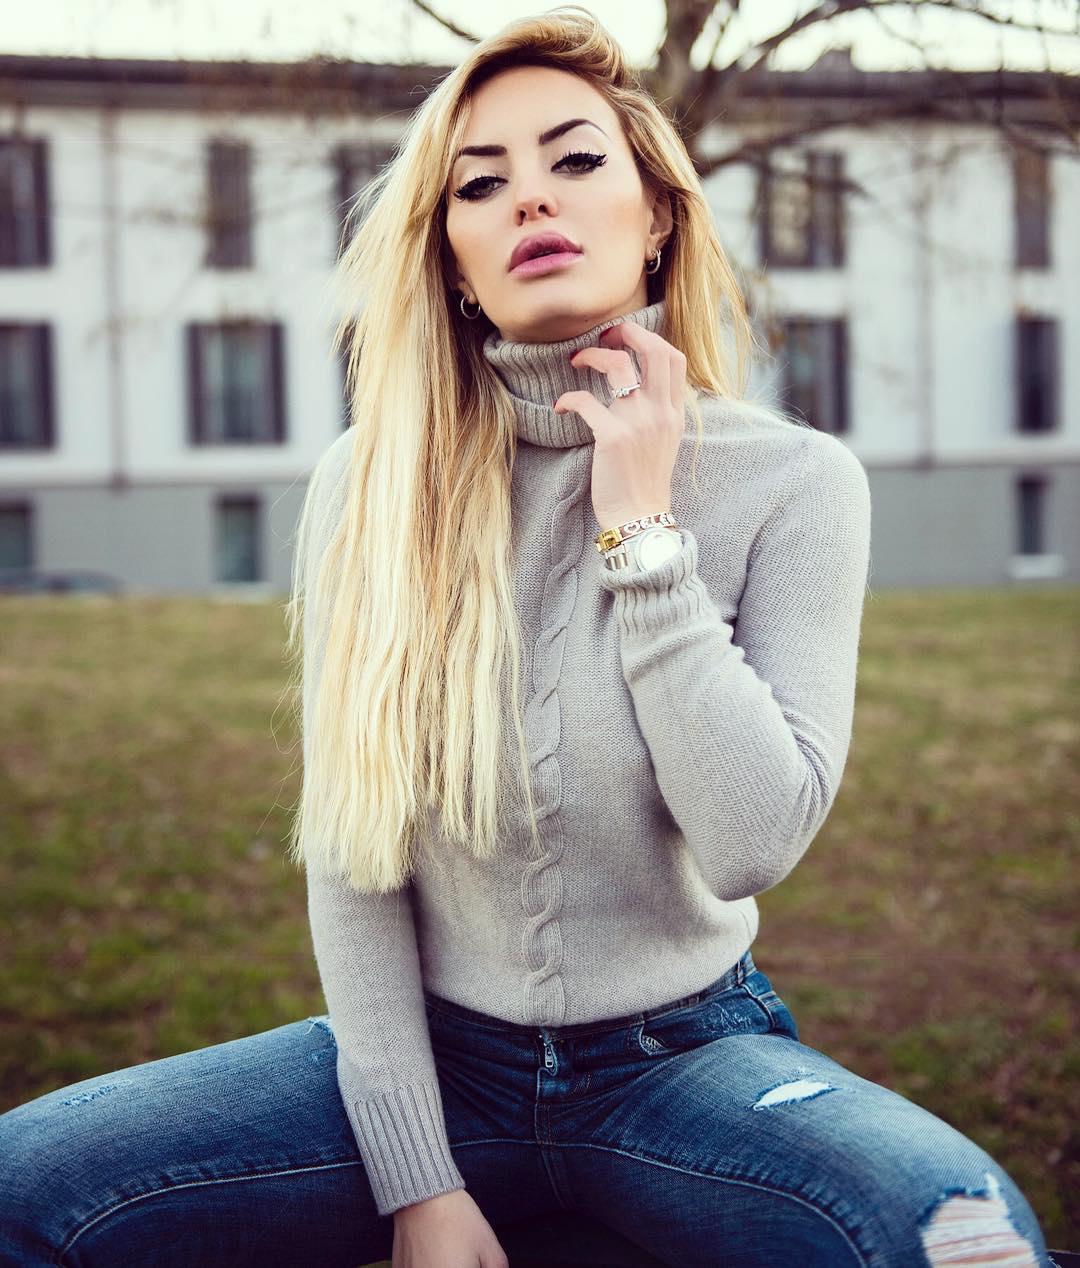 Elena-Morali-Wallpapers-Insta-Fit-Bio-2